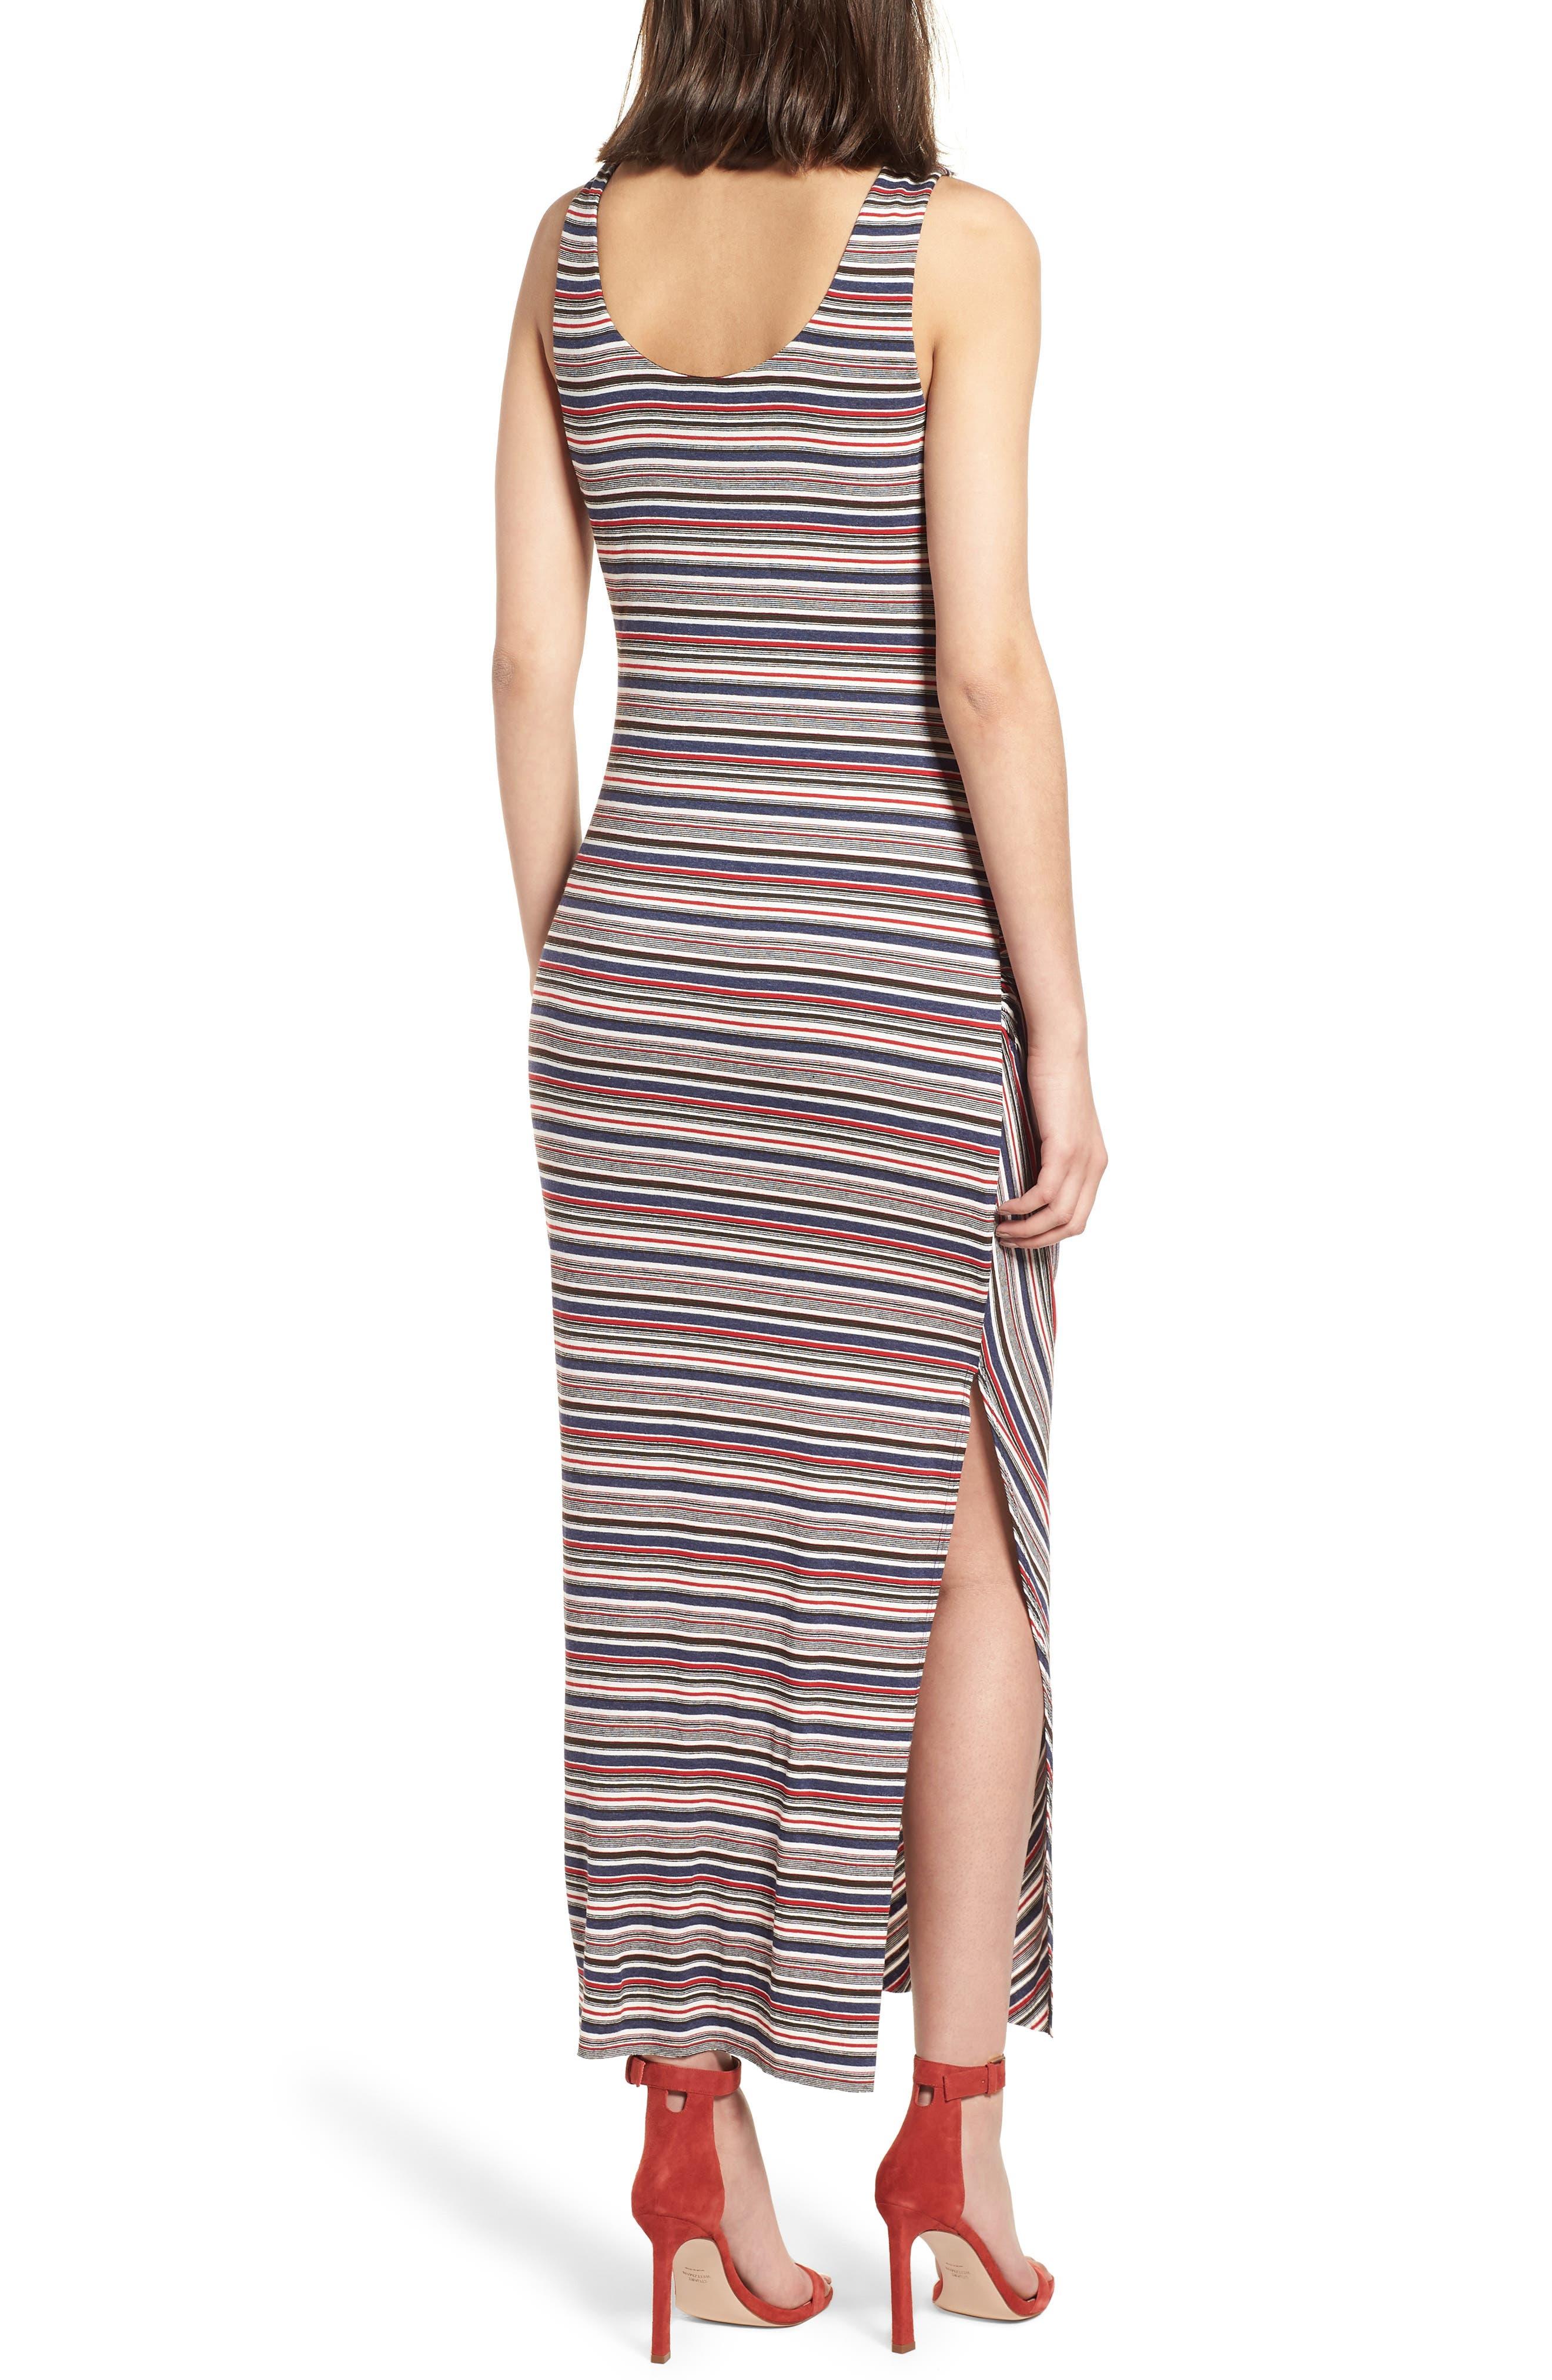 Duststorm Stripe Maxi Tank Dress,                             Alternate thumbnail 2, color,                             411